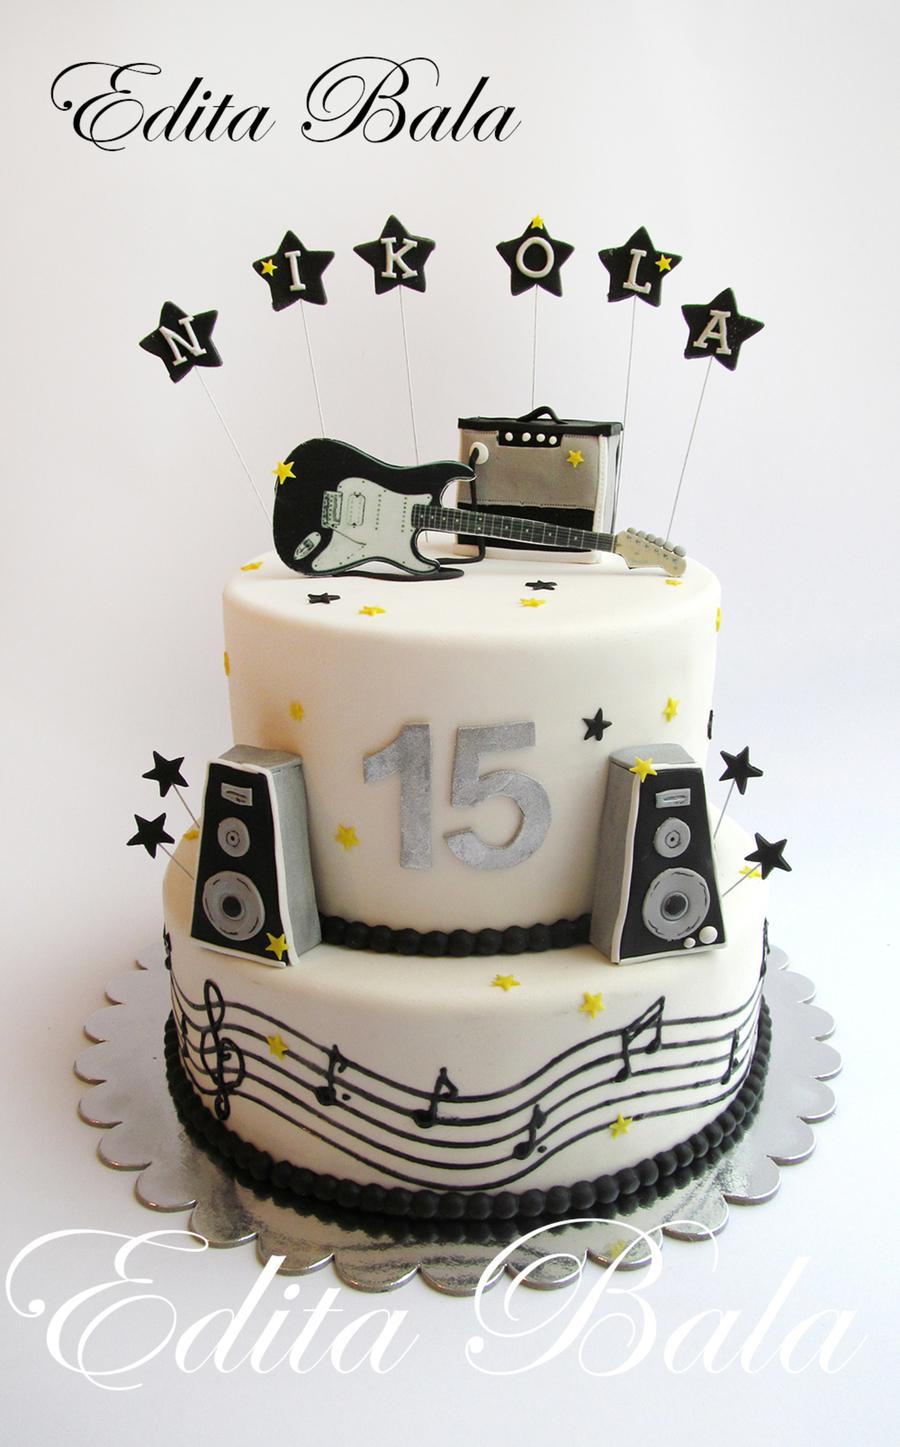 Cake Decorating Ideas Music Theme : Music & Gouitar Themed Cake - CakeCentral.com